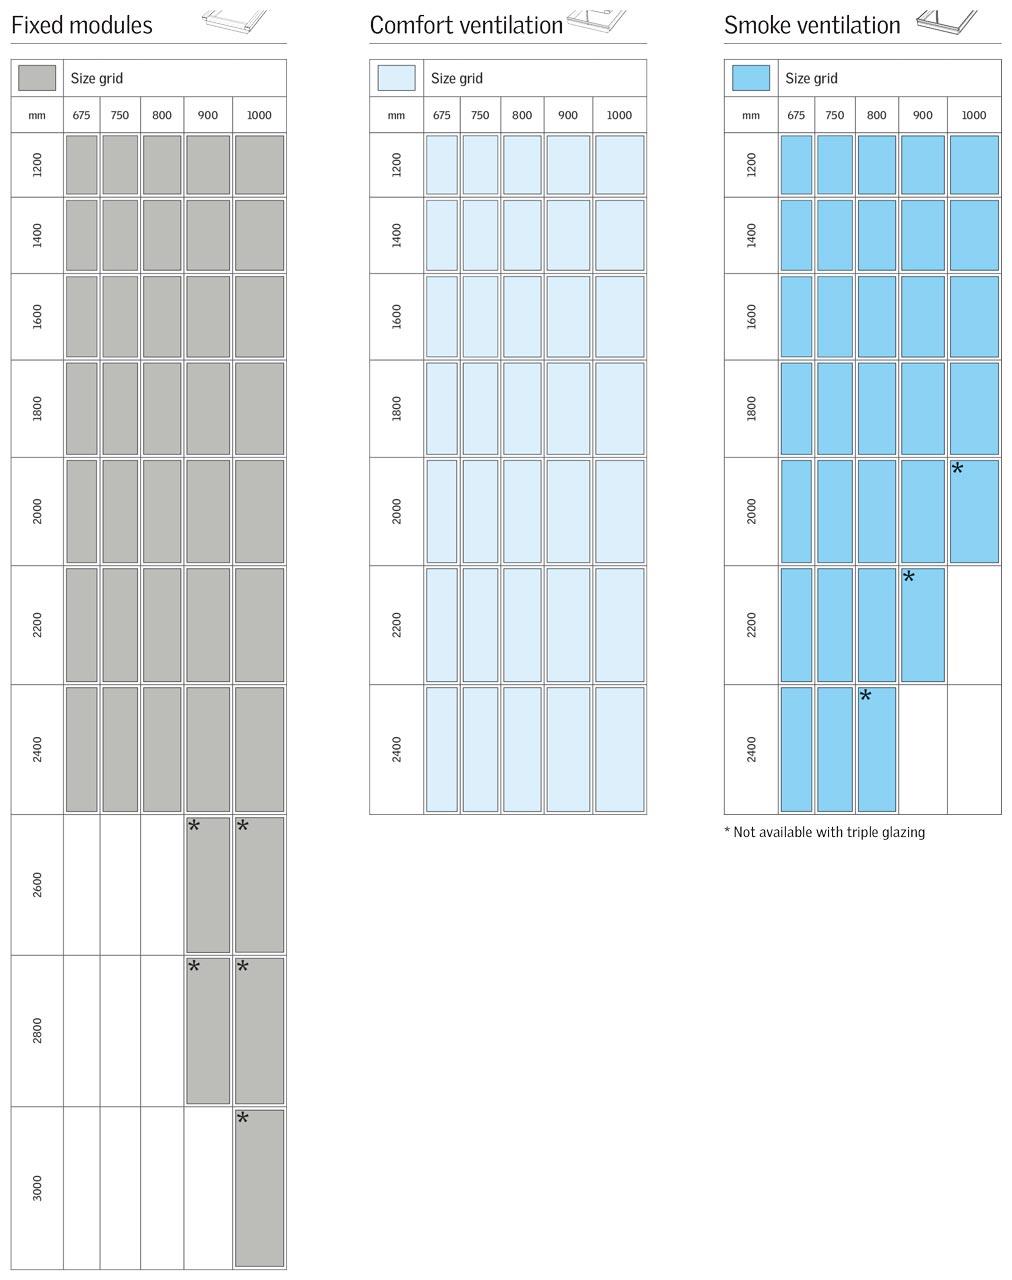 size-grid